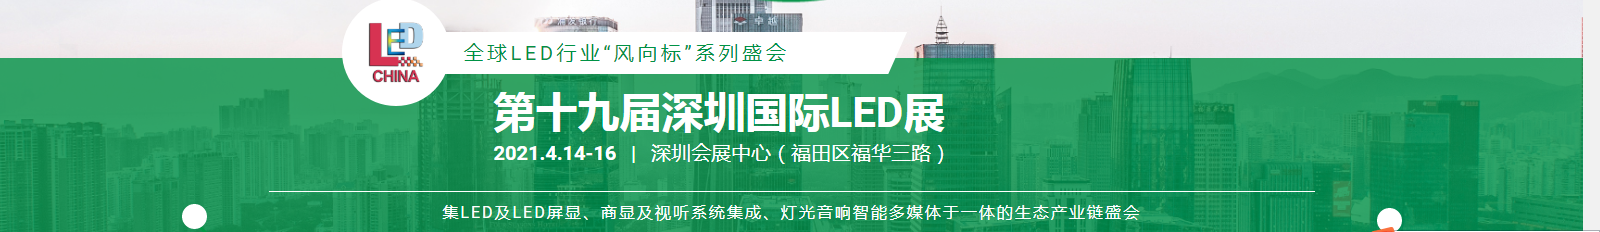 LED CHINA及音视频智慧集成展 2021